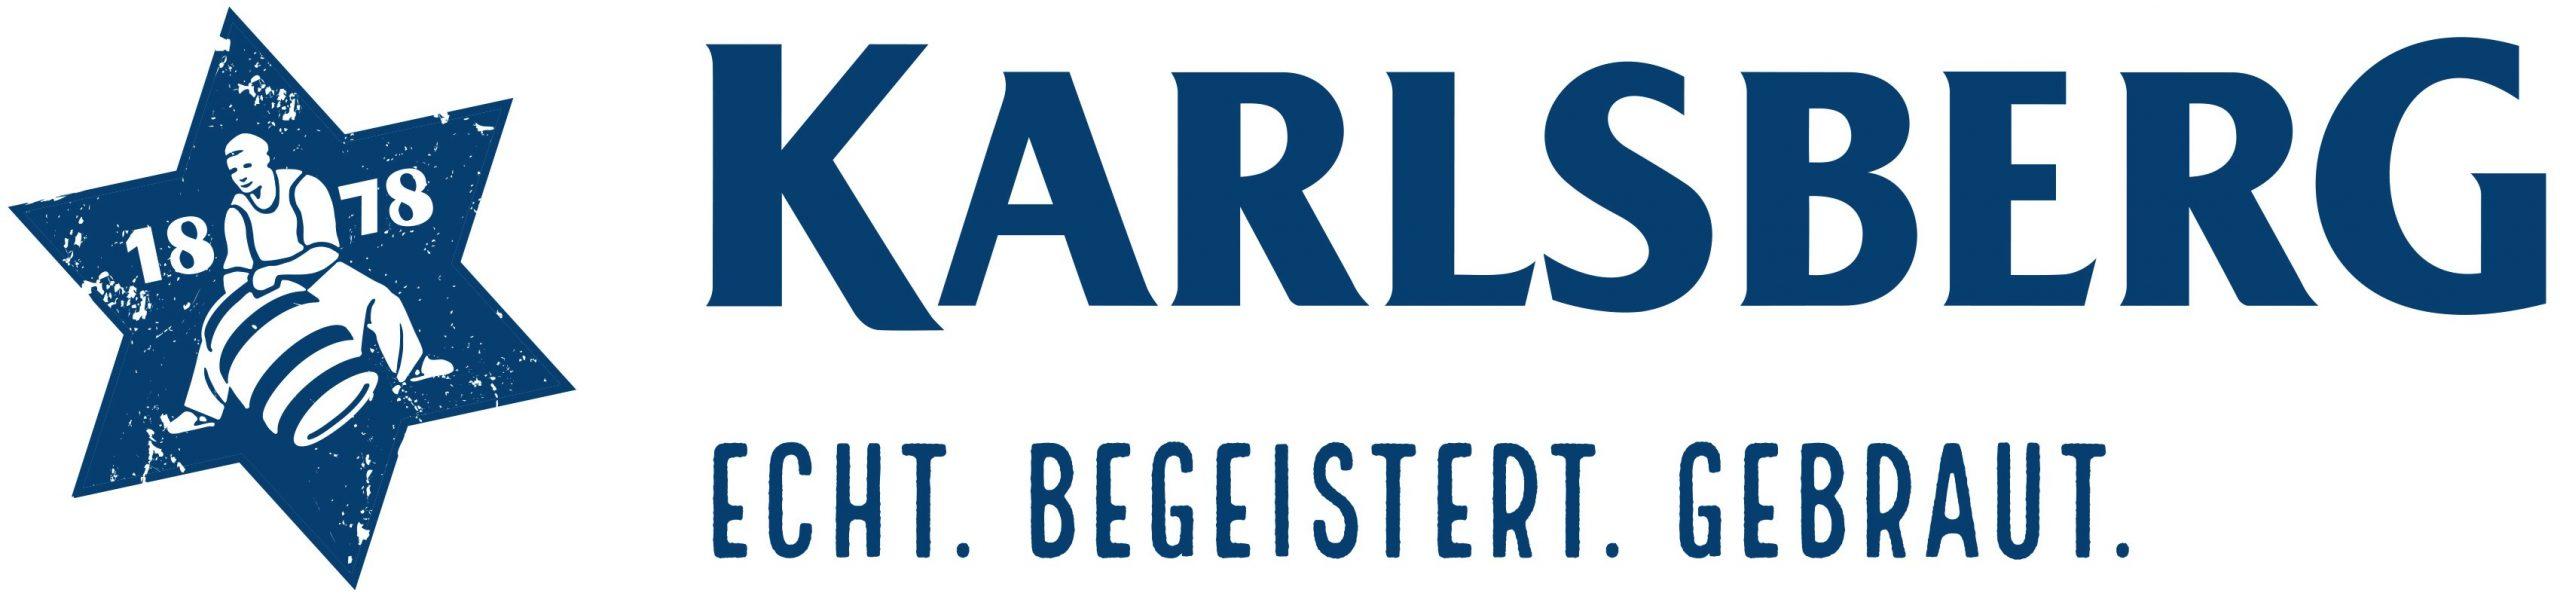 Karlsberg